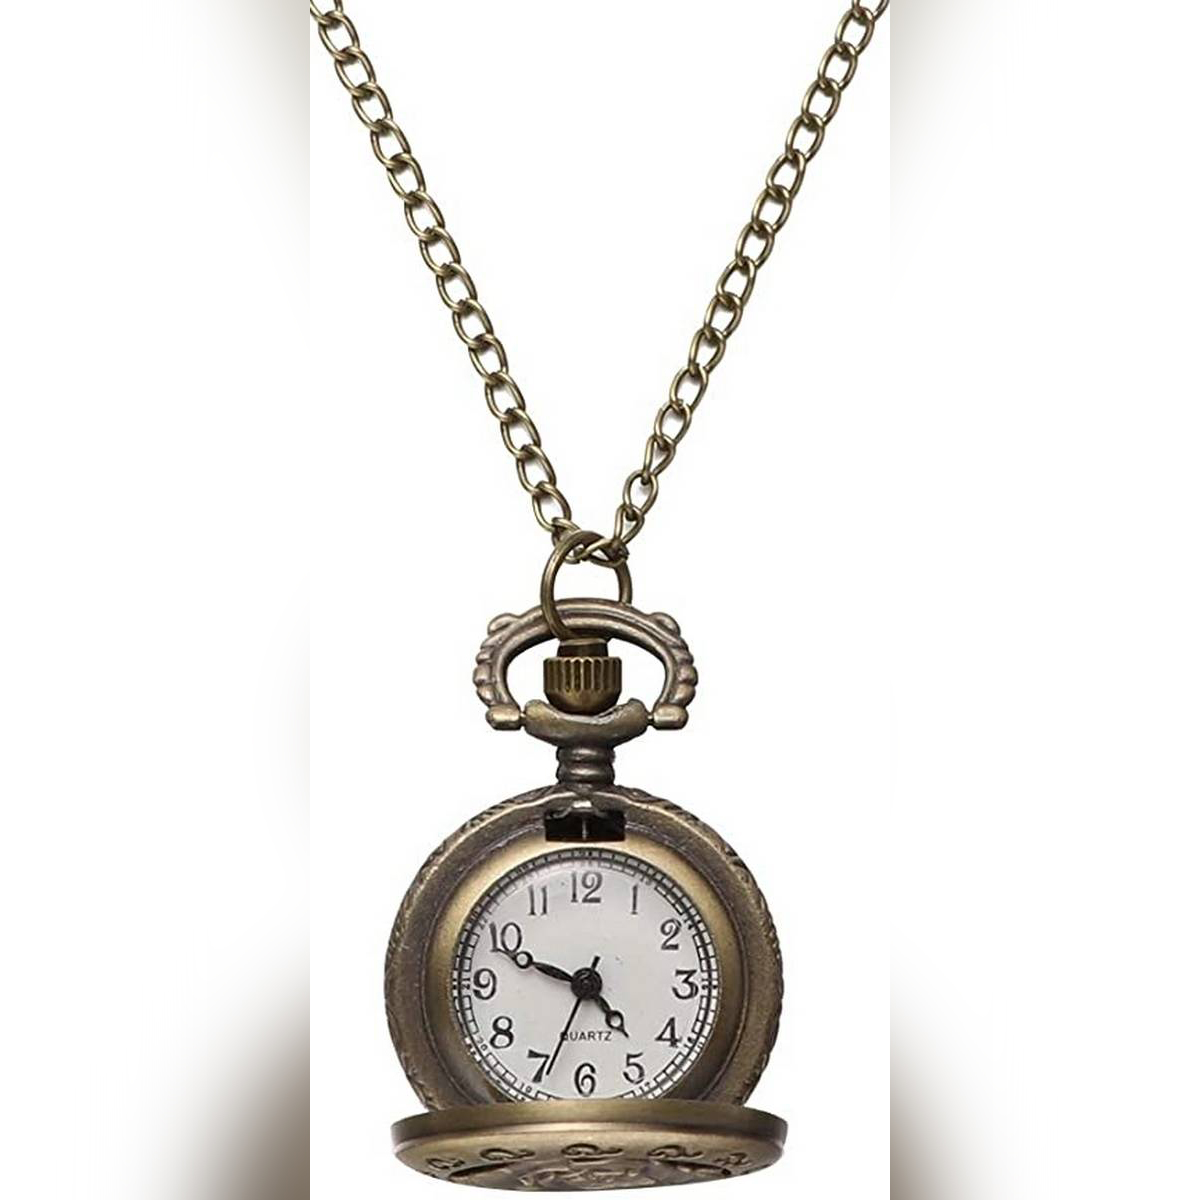 New Dual Display Clamshell Rome Retro Hollow Imitation Mechanical Unisex Men Women Pocket Watch Gift